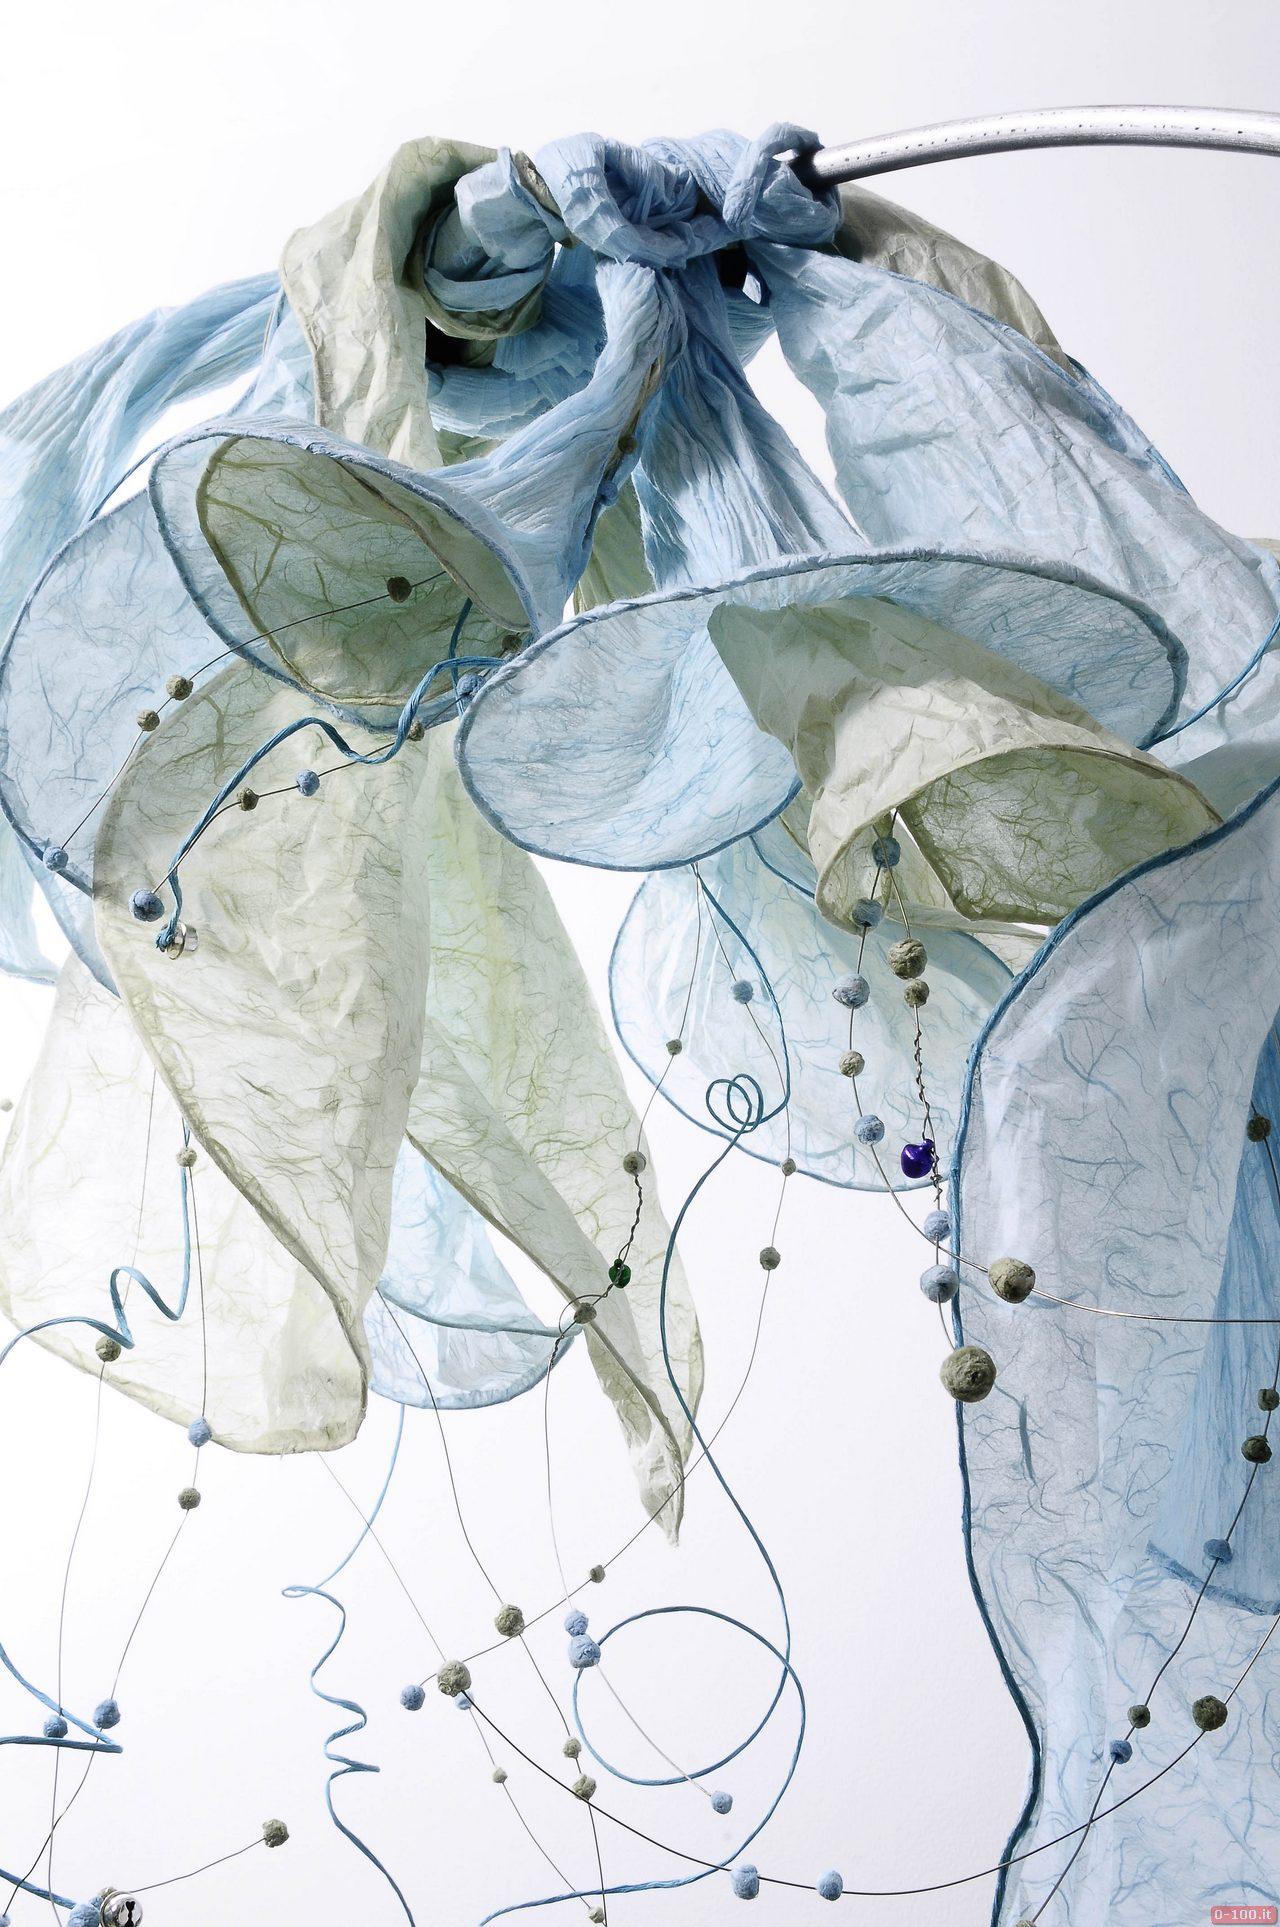 Blooming Creativity_Private Conversation - Esther Farrache _Van Cleef & Arpels_0-100 3